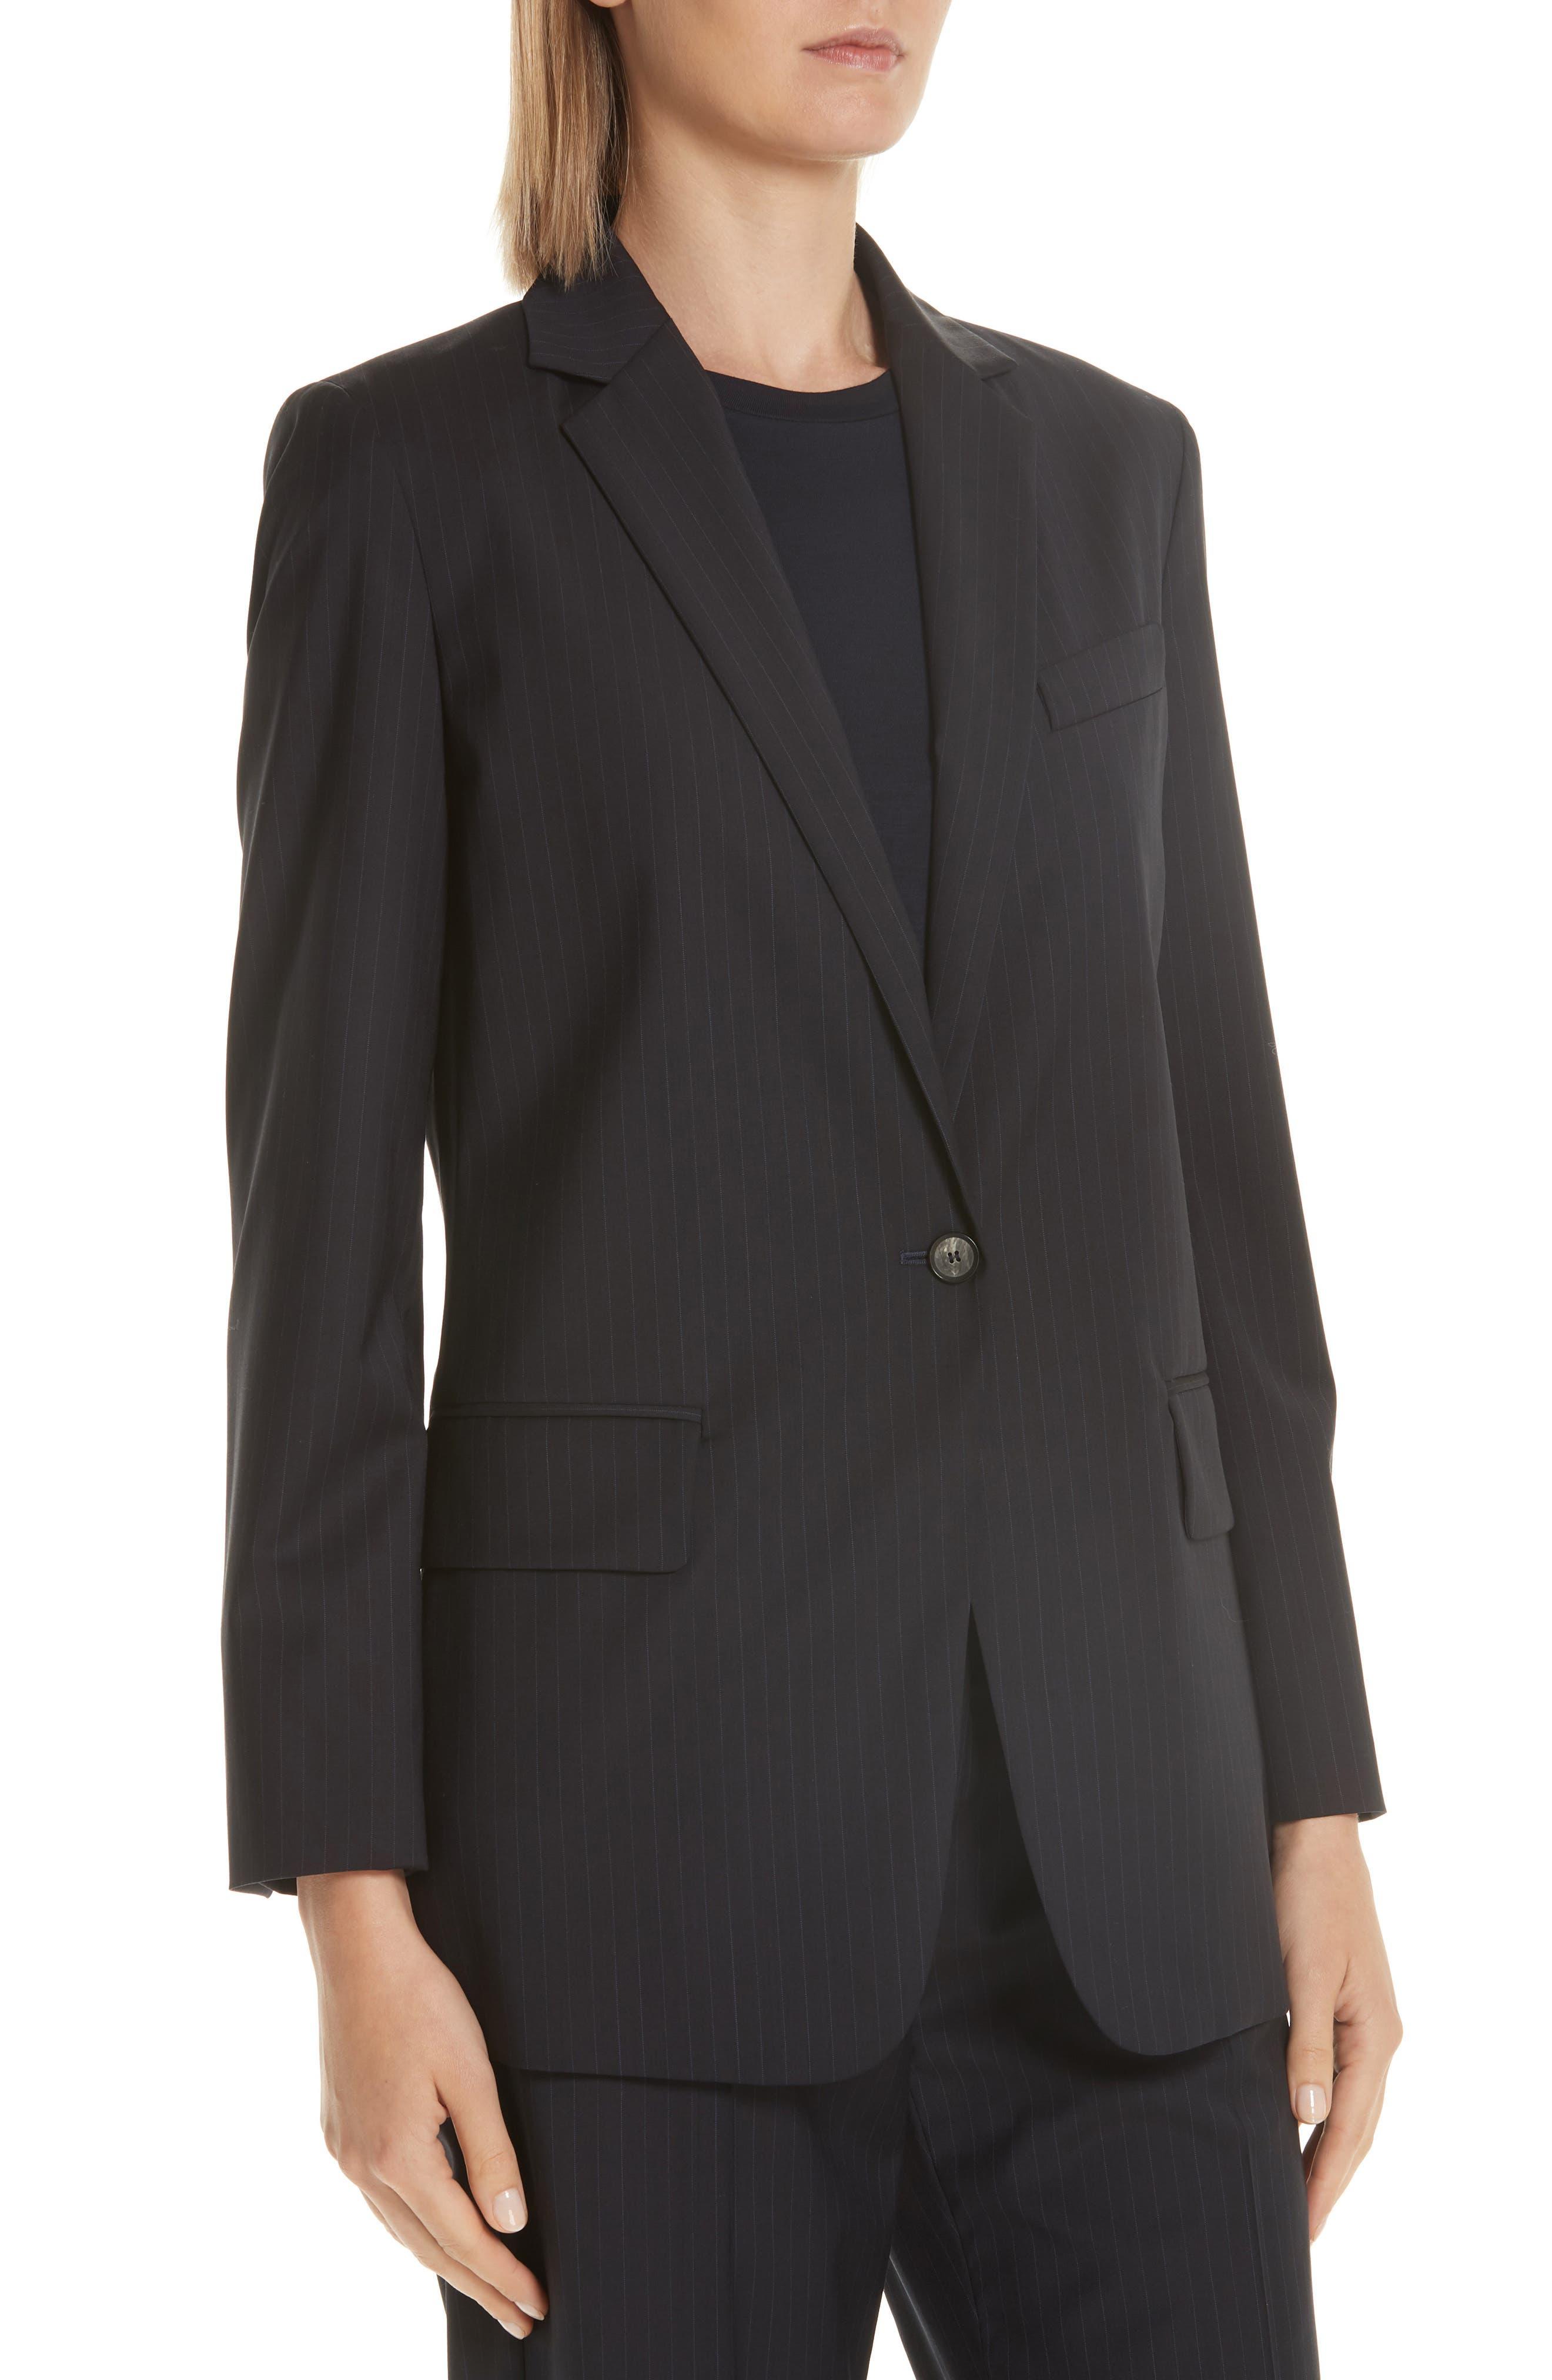 MAX MARA,                             Laser Single Button Wool Jacket,                             Alternate thumbnail 4, color,                             ULTRAMARINE